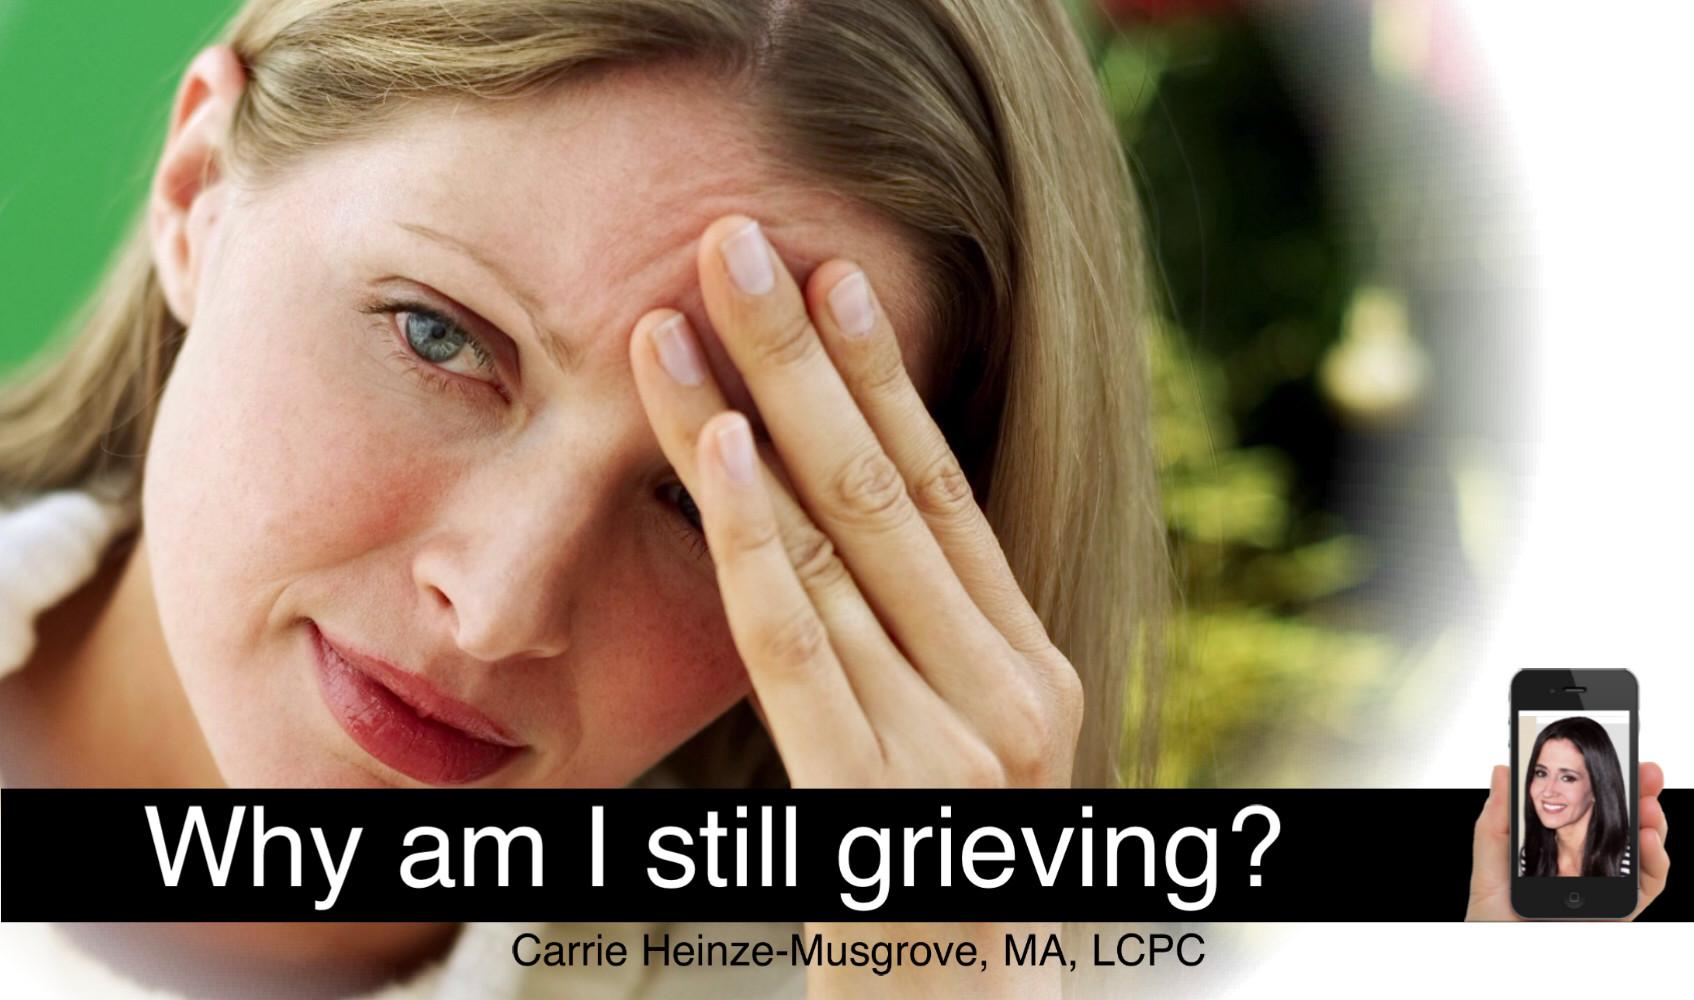 Why am I still grieving?